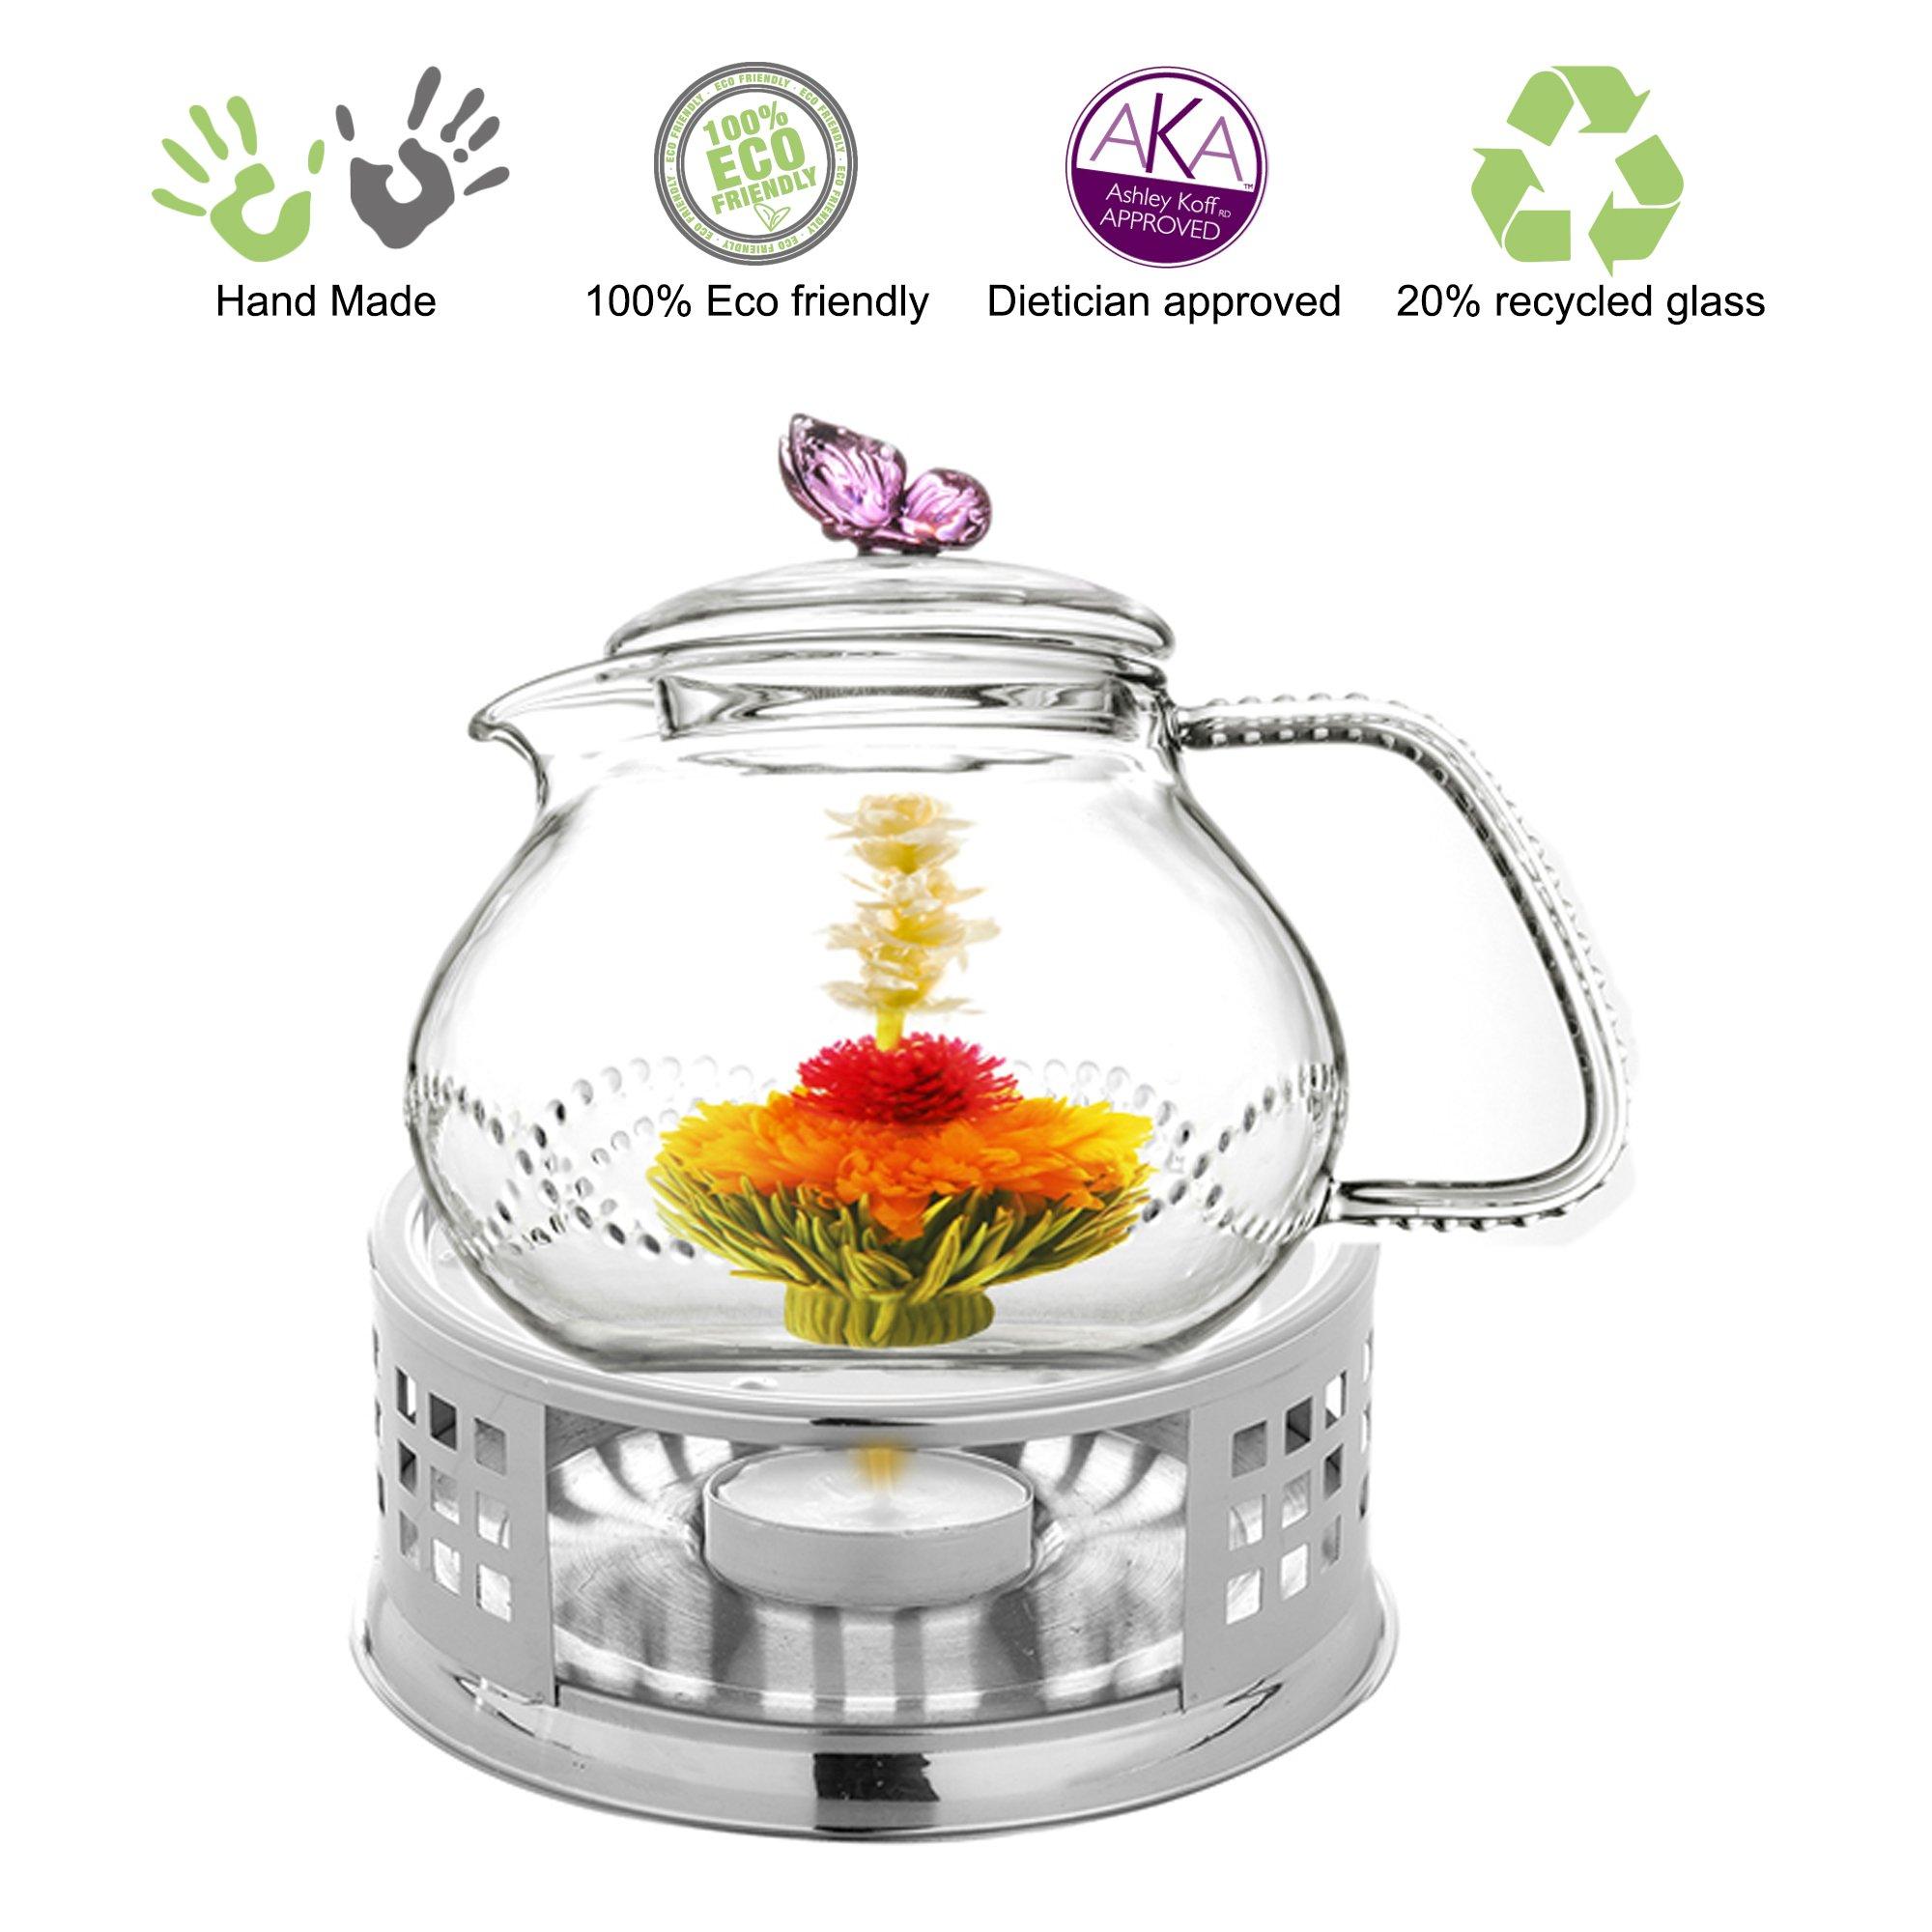 Teapot Set Teapot Pink Butterfly 24 Oz and Stainless Steel Tea Warmer Alex for Flowering Tea Green Tea Black Tea Puer by Tea Beyond